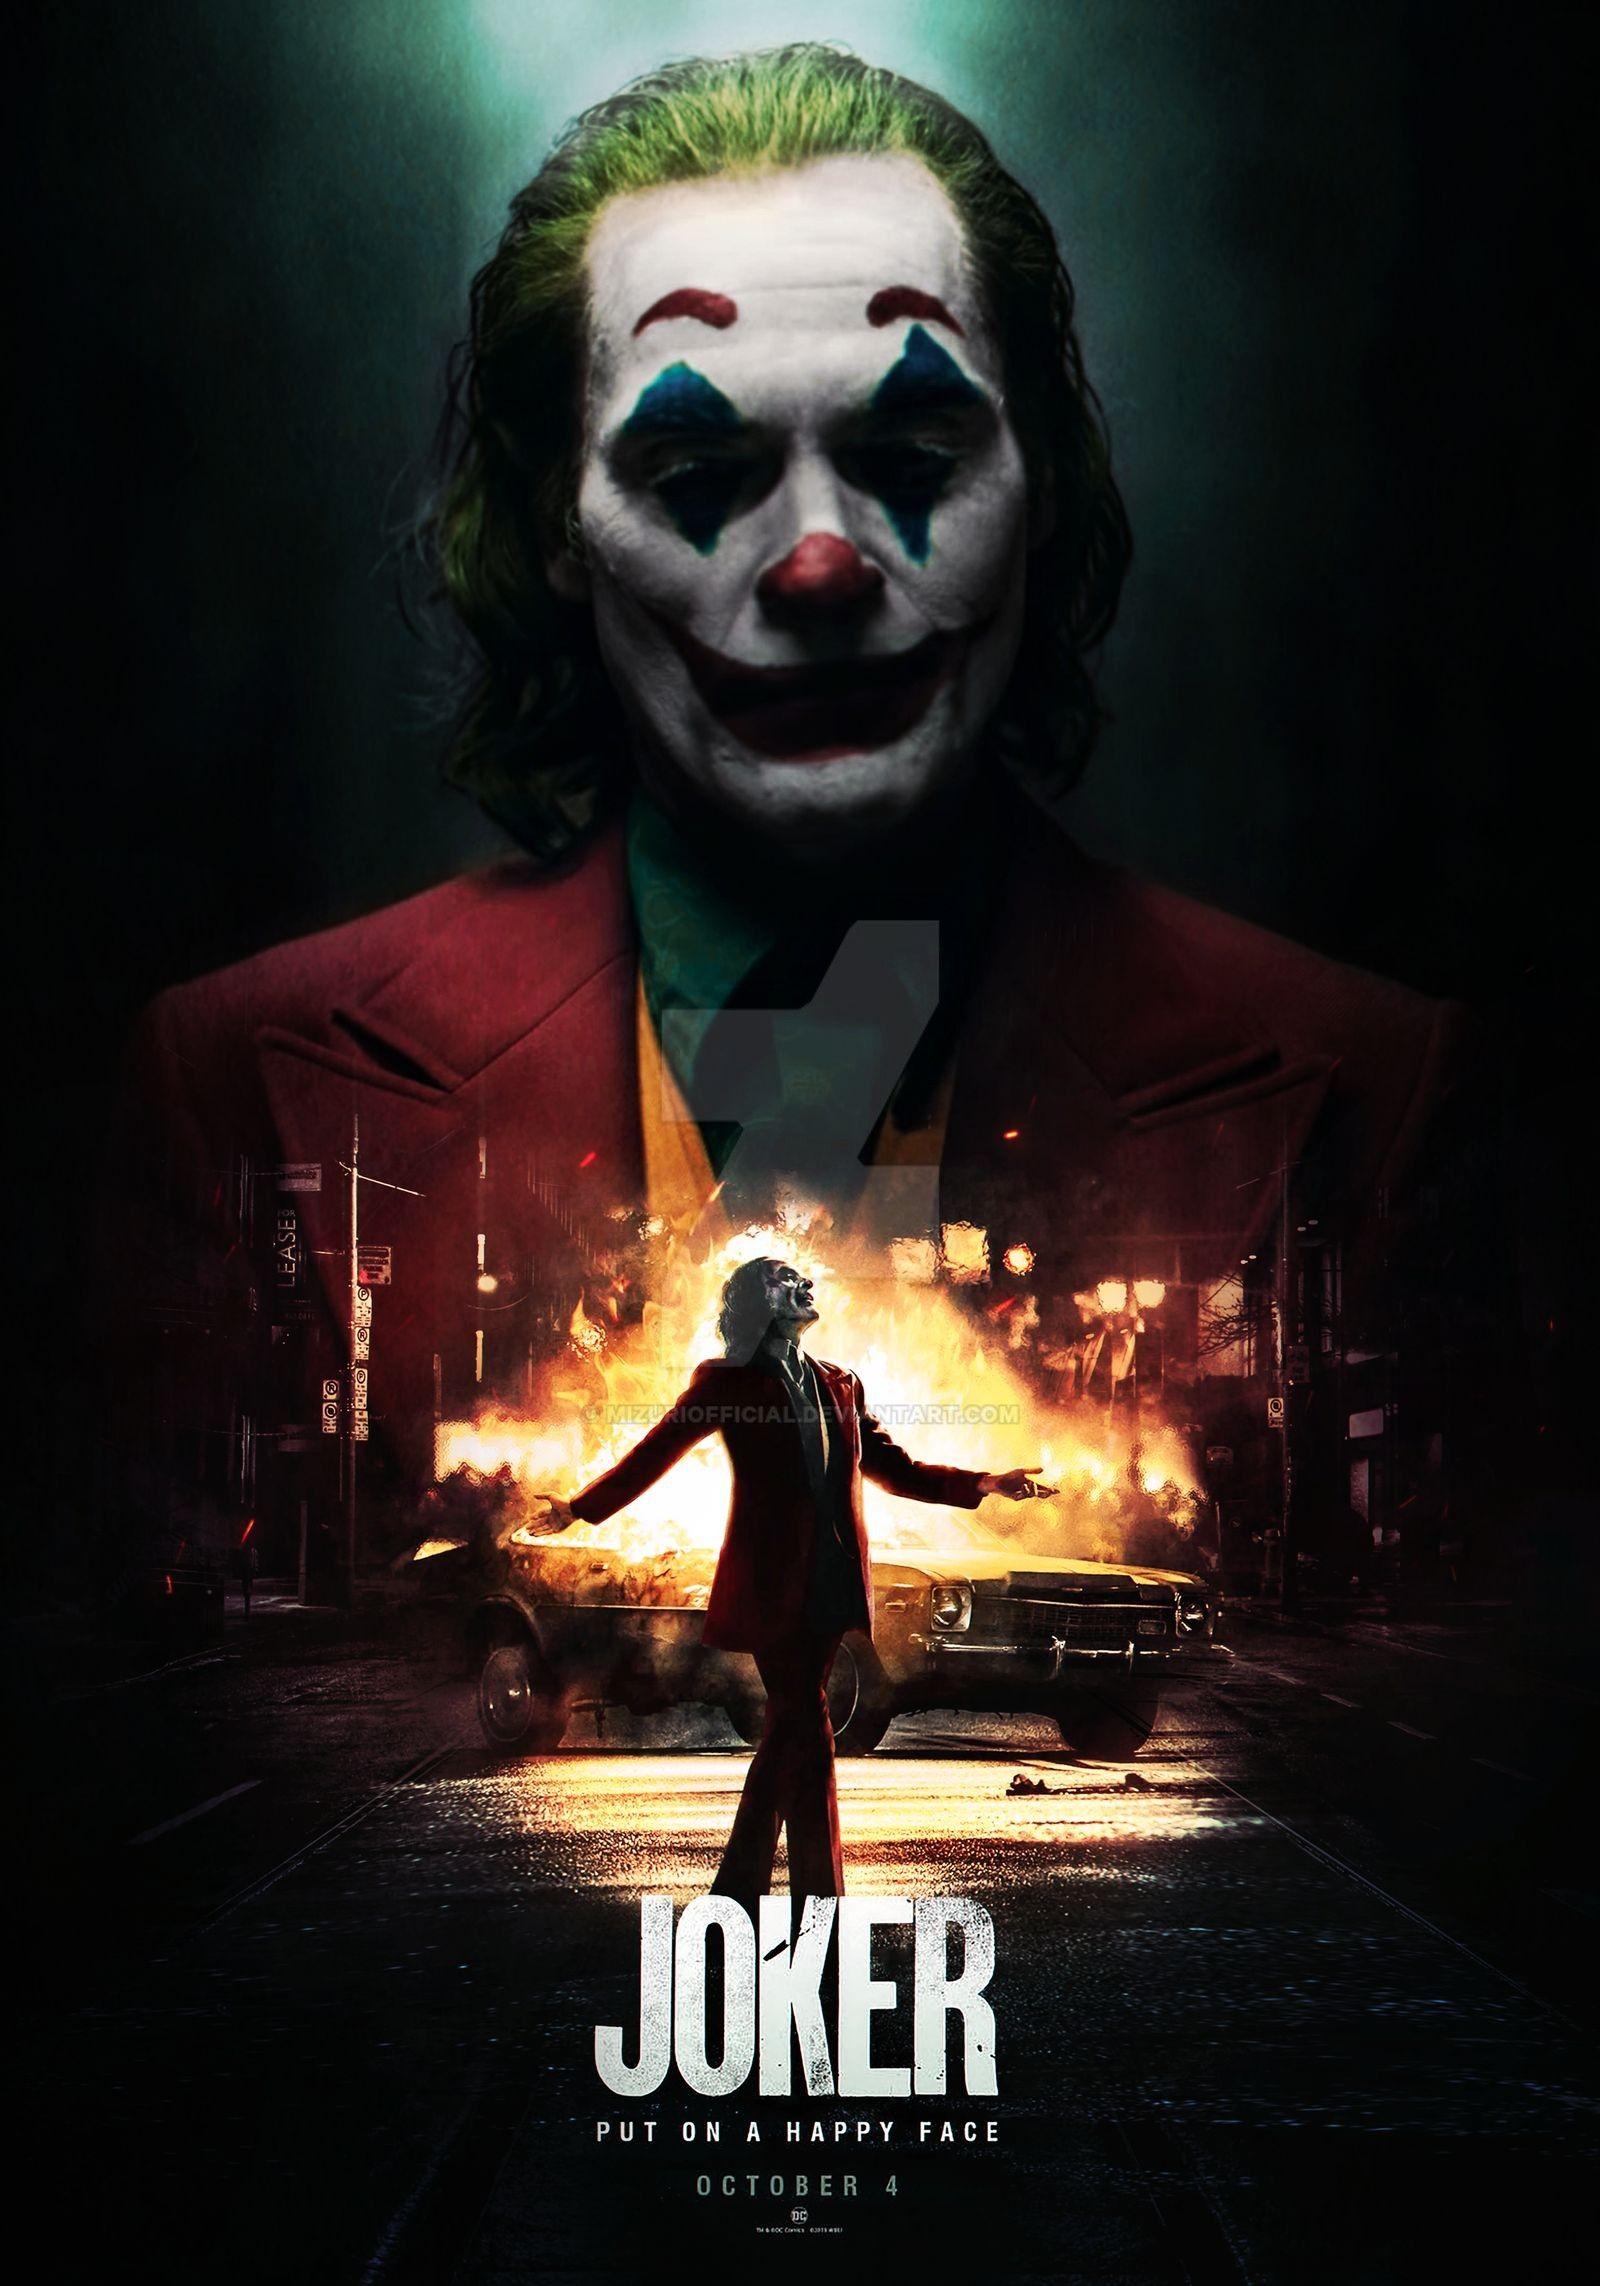 The Joker Chaos By Mizuriofficial On Deviantart Joker Joker Poster Joker Wallpapers